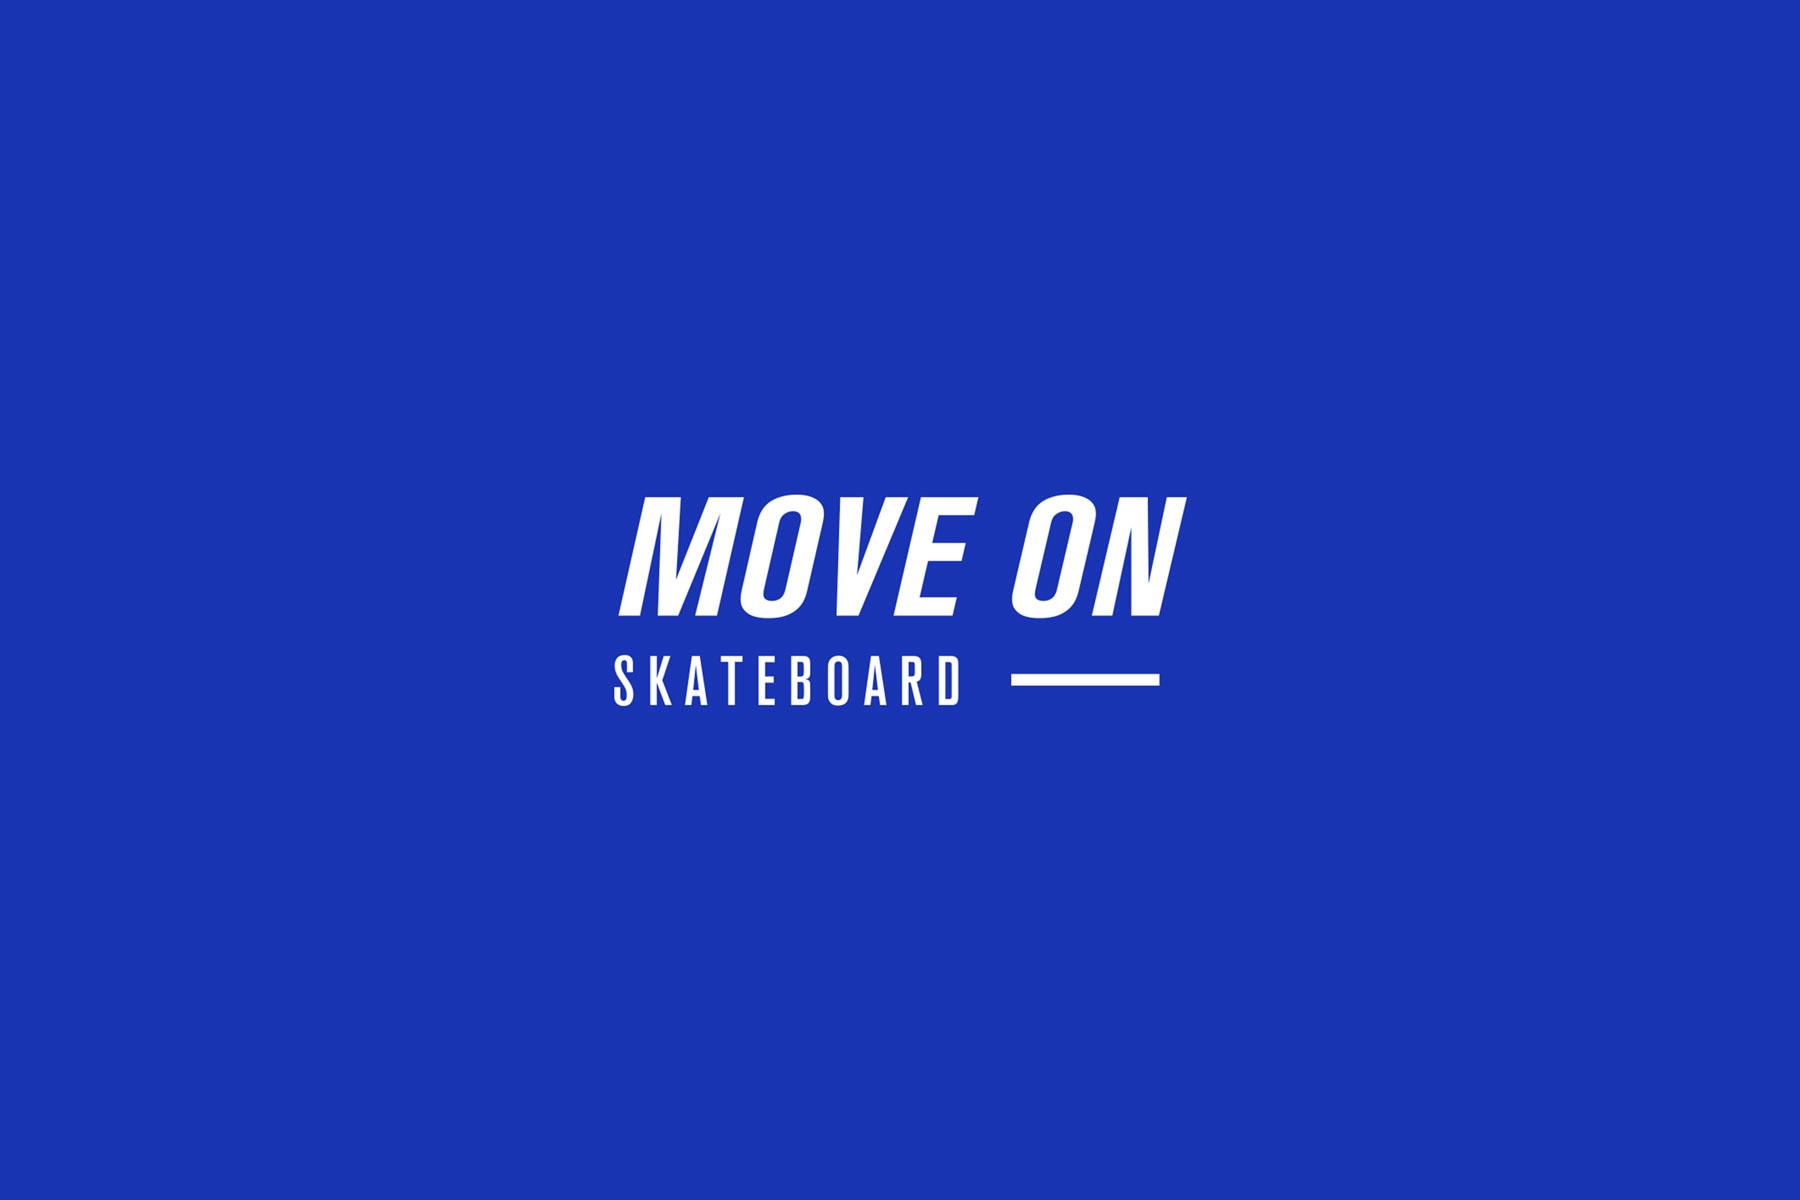 diseño logotipo skateboard negativo